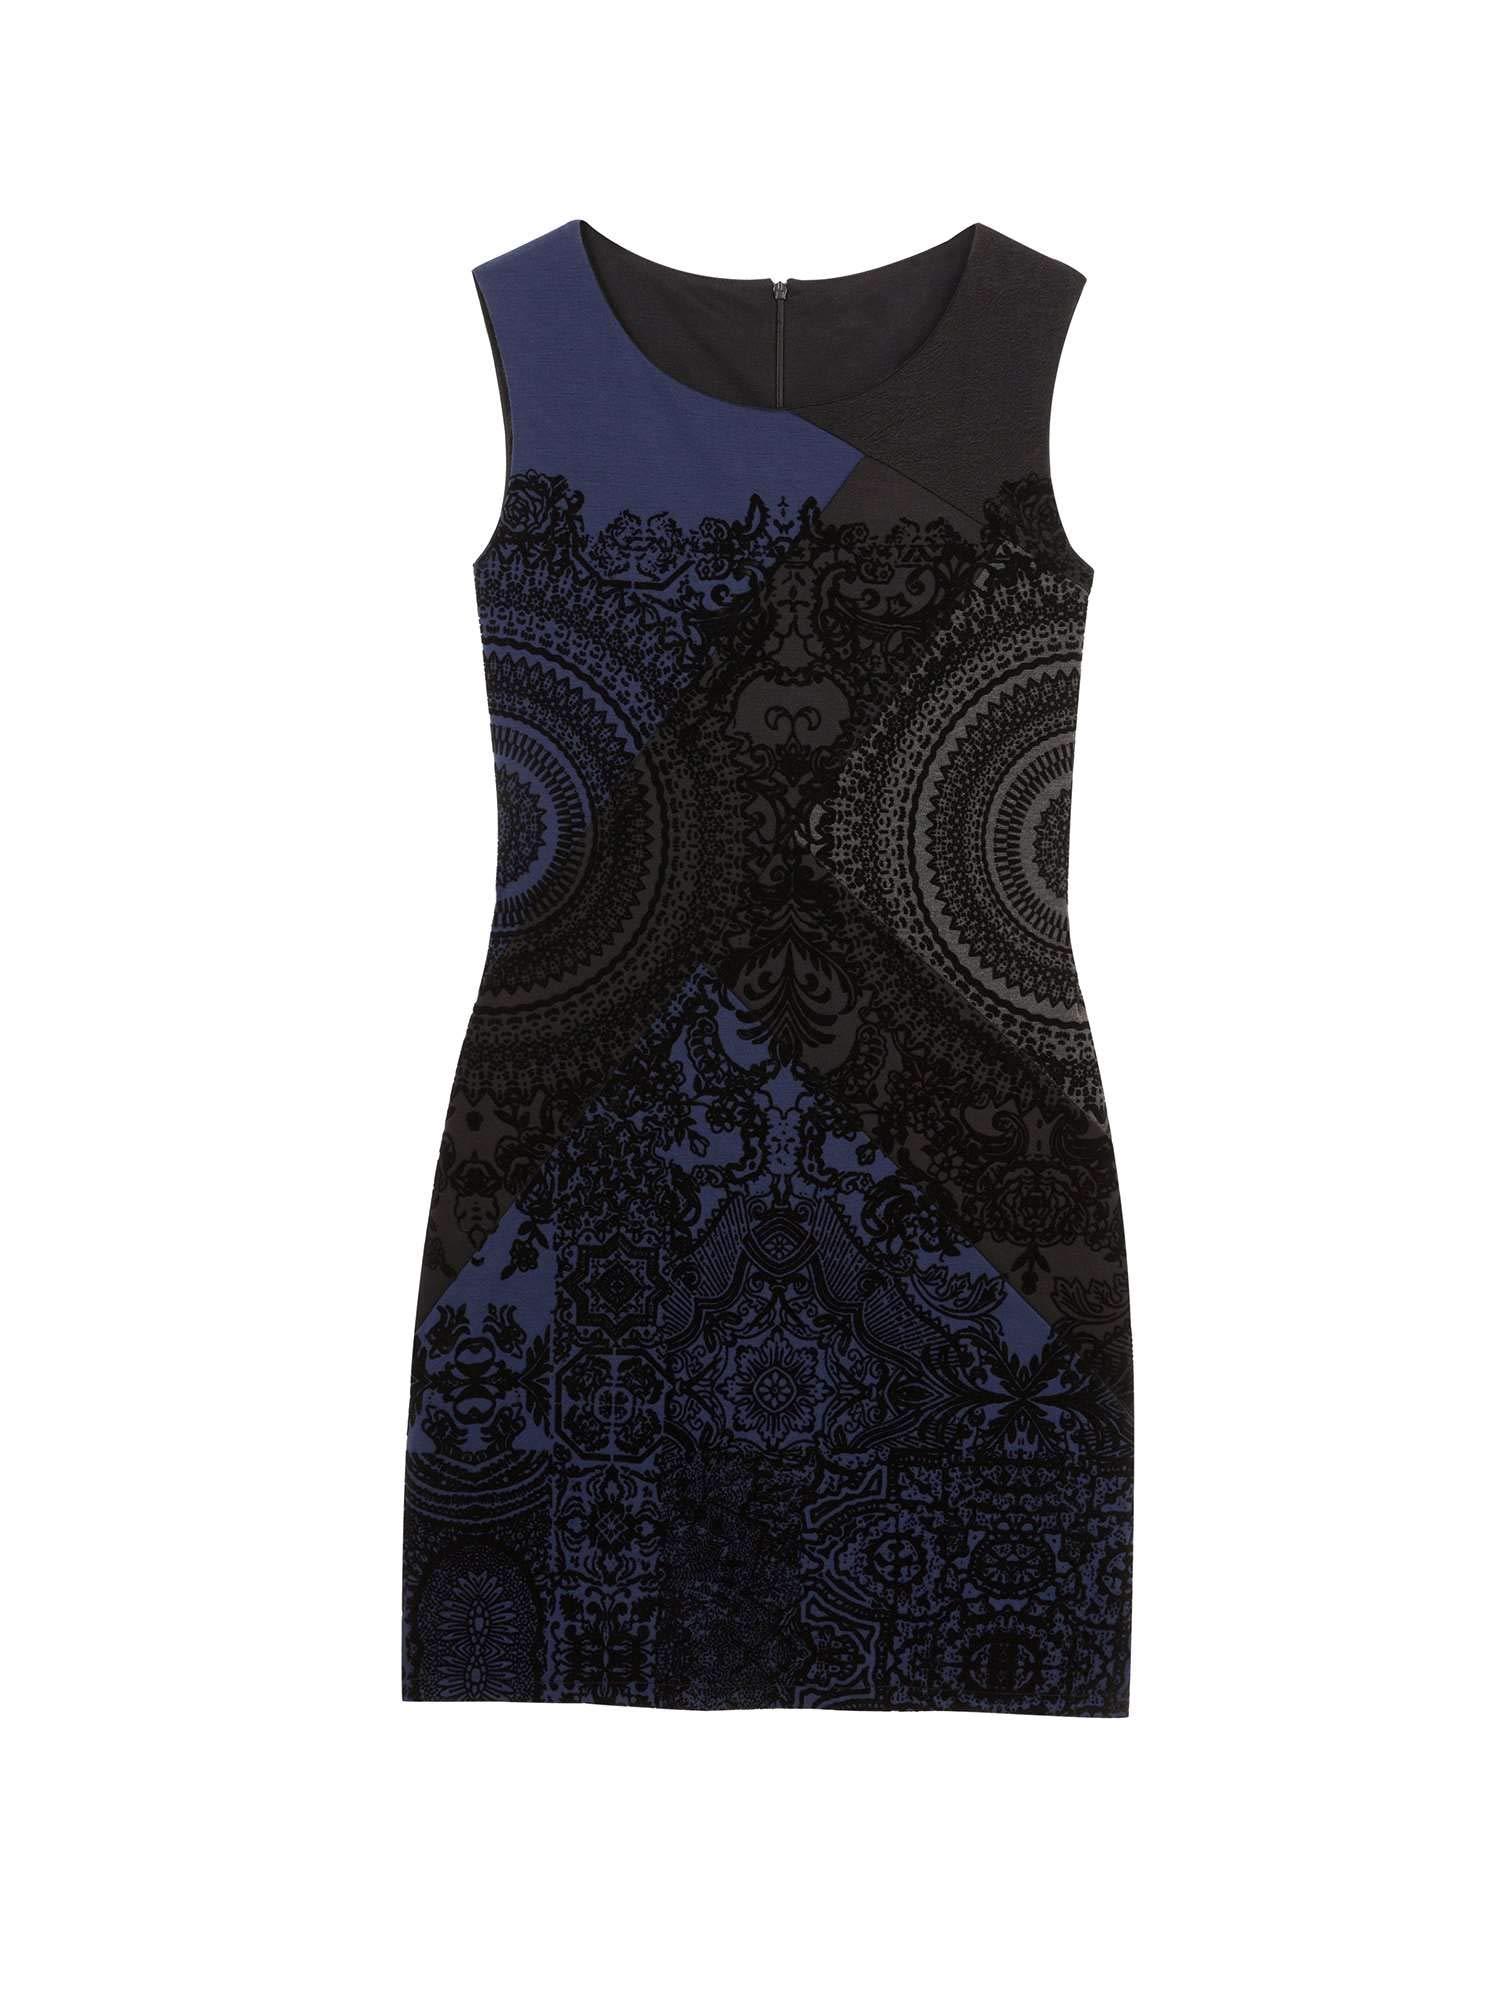 Desigual 18WWVK93 Dress Mujeres